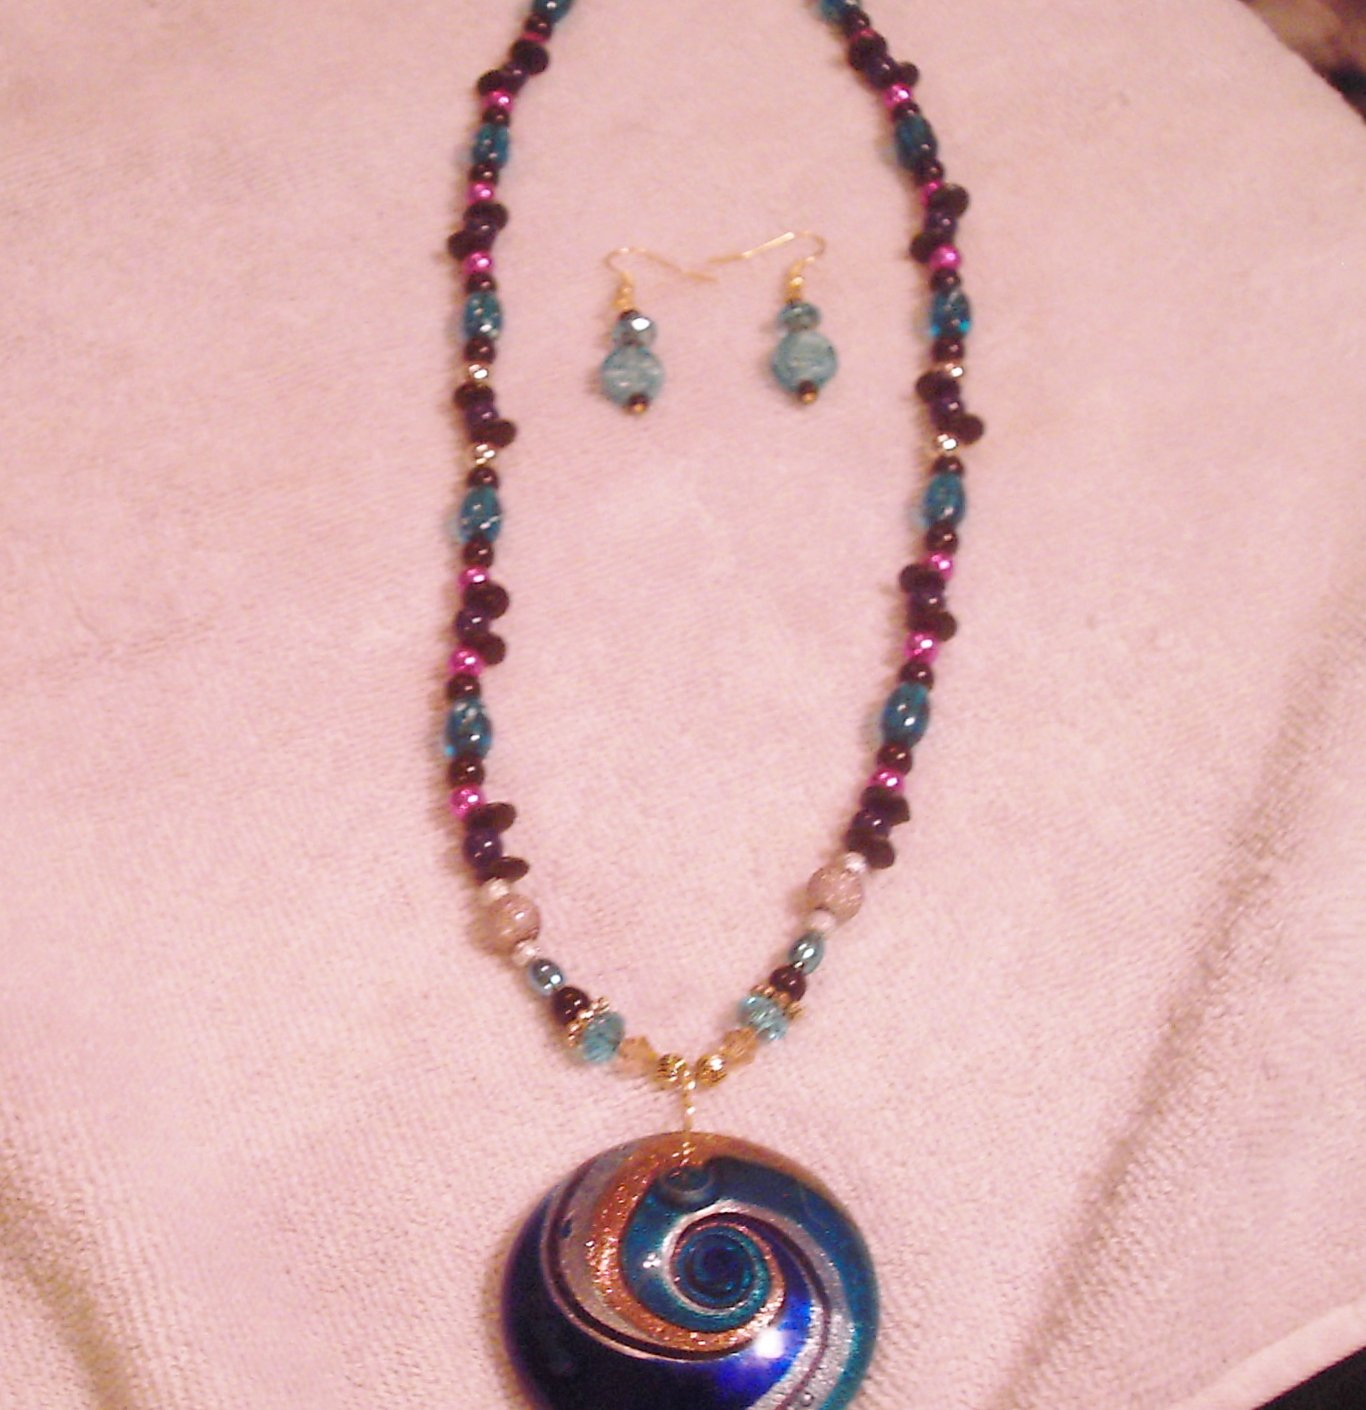 Handmade Swirl Necklace and Earrings Set